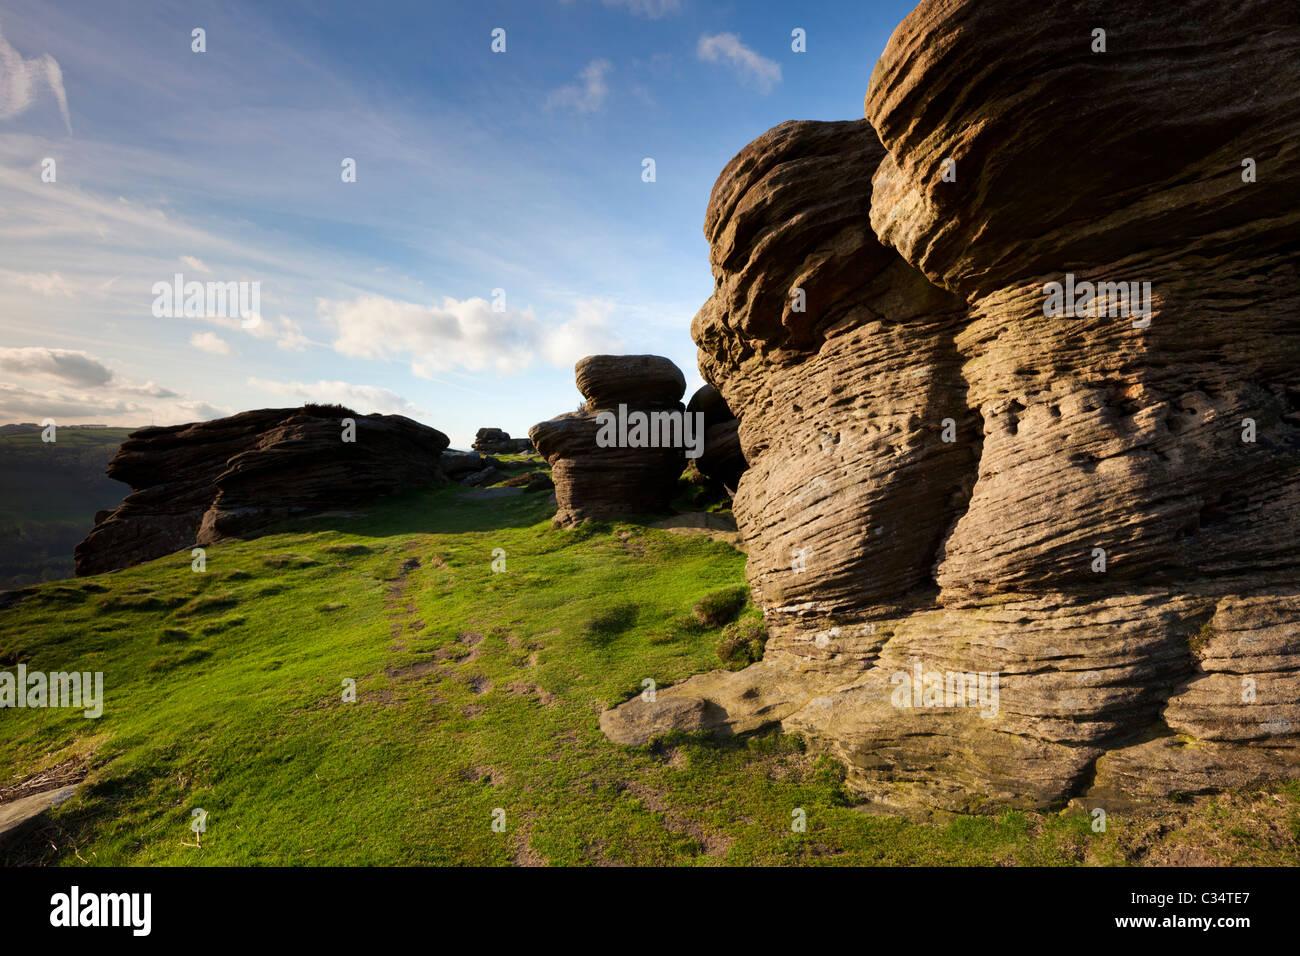 Gritstone rocks on Froggatt Edge Derbyshire Peak district national park England GB UK EU Europe - Stock Image